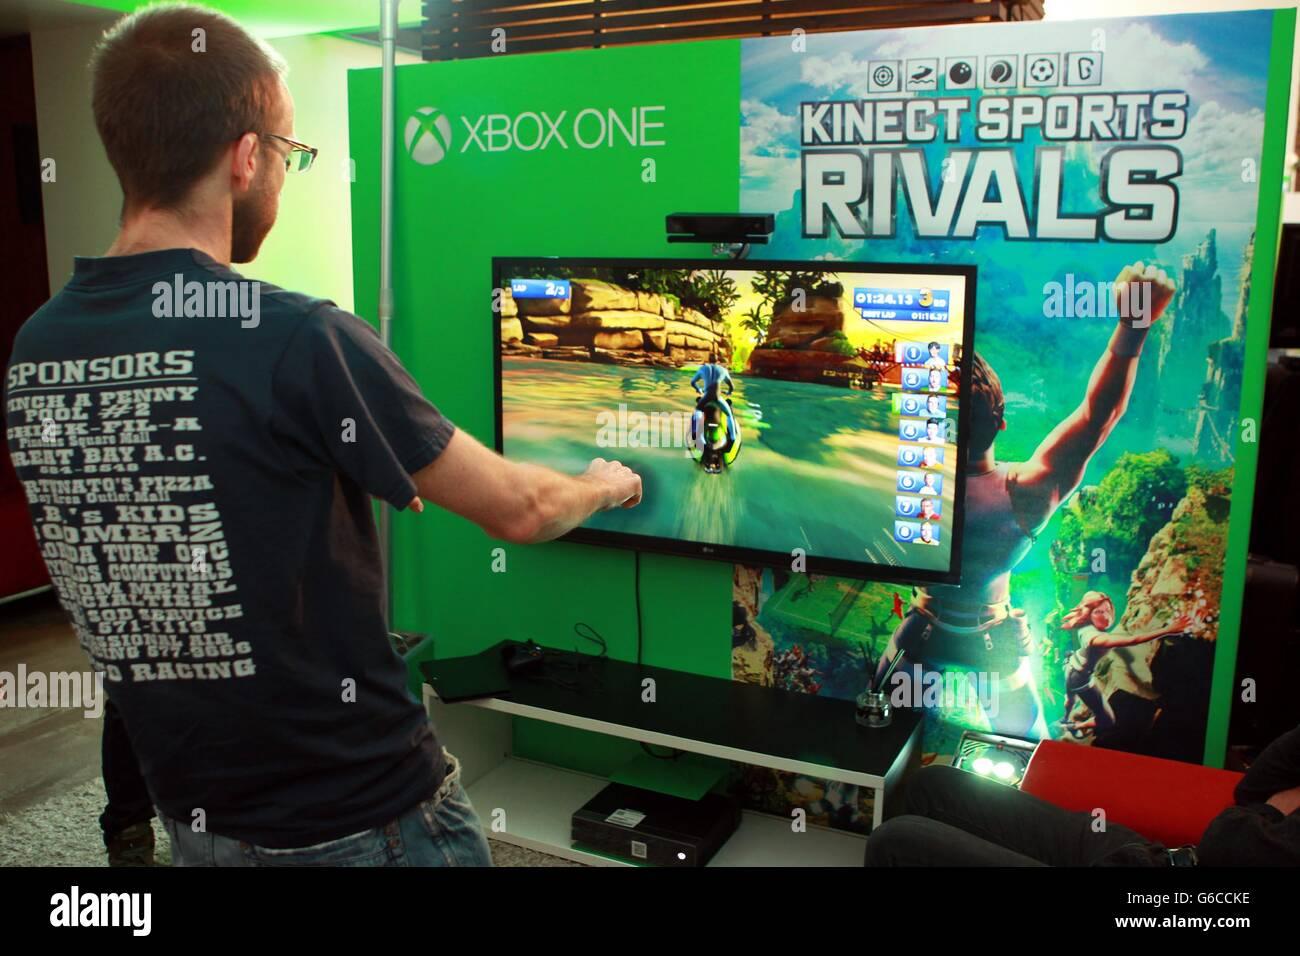 Xbox One revealed - London Stock Photo: 107223522 - Alamy